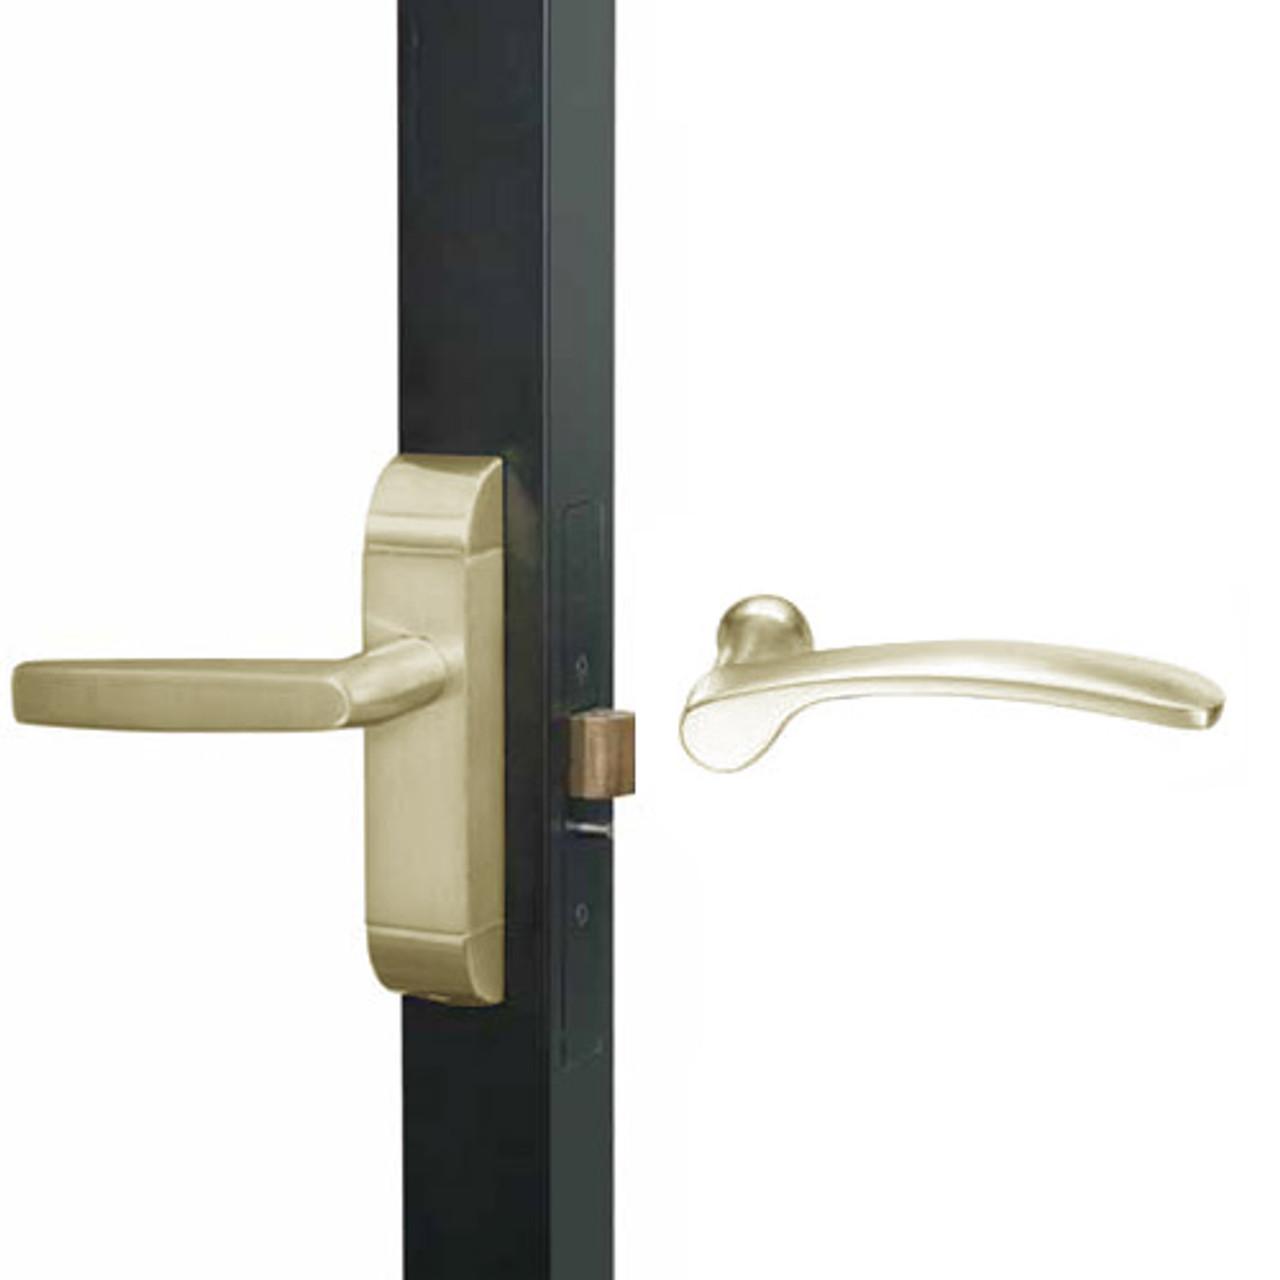 4600-MN-632-US4 Adams Rite MN Designer Deadlatch handle in Satin Brass Finish